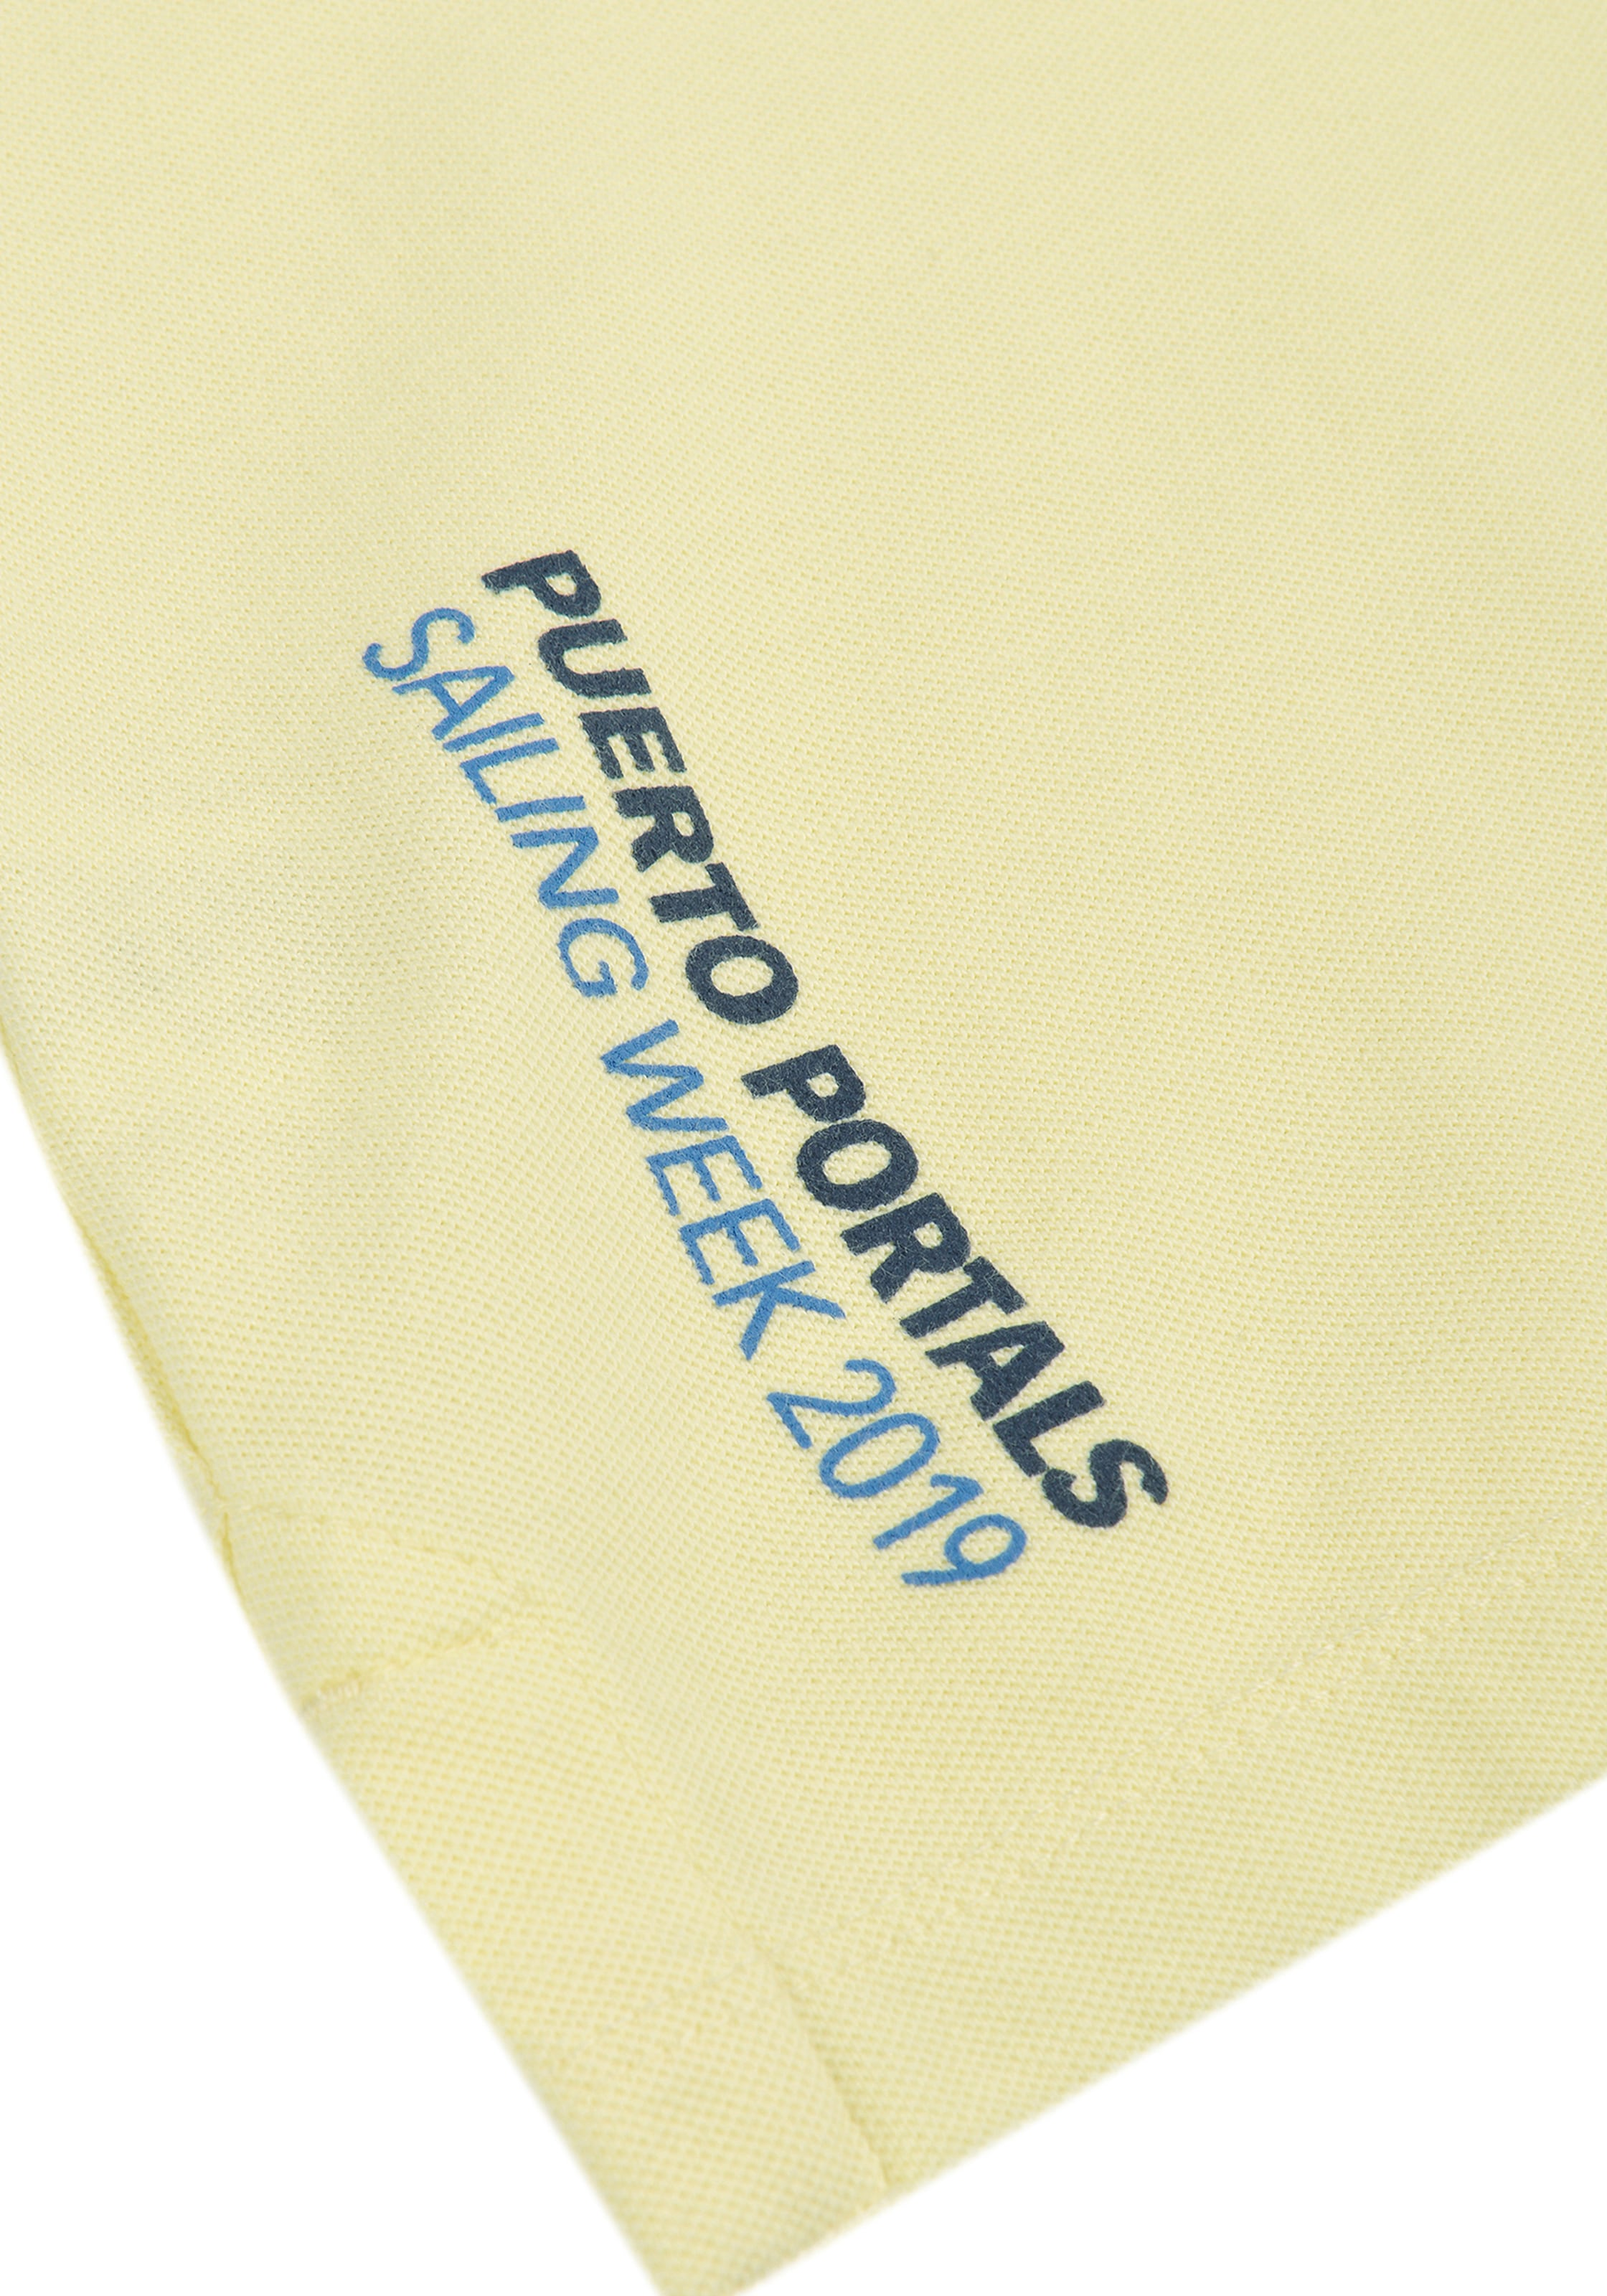 Shirt Code In Gelb Polo 'puerto zero Portals' gyvbfmIY76